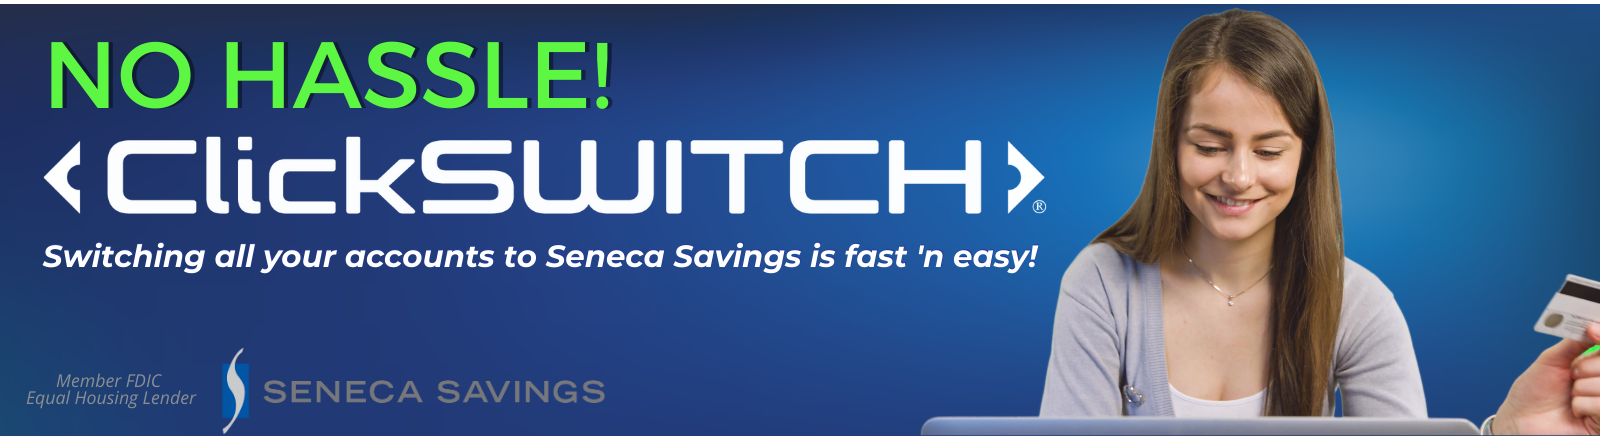 clickswitch banking service with seneca savings